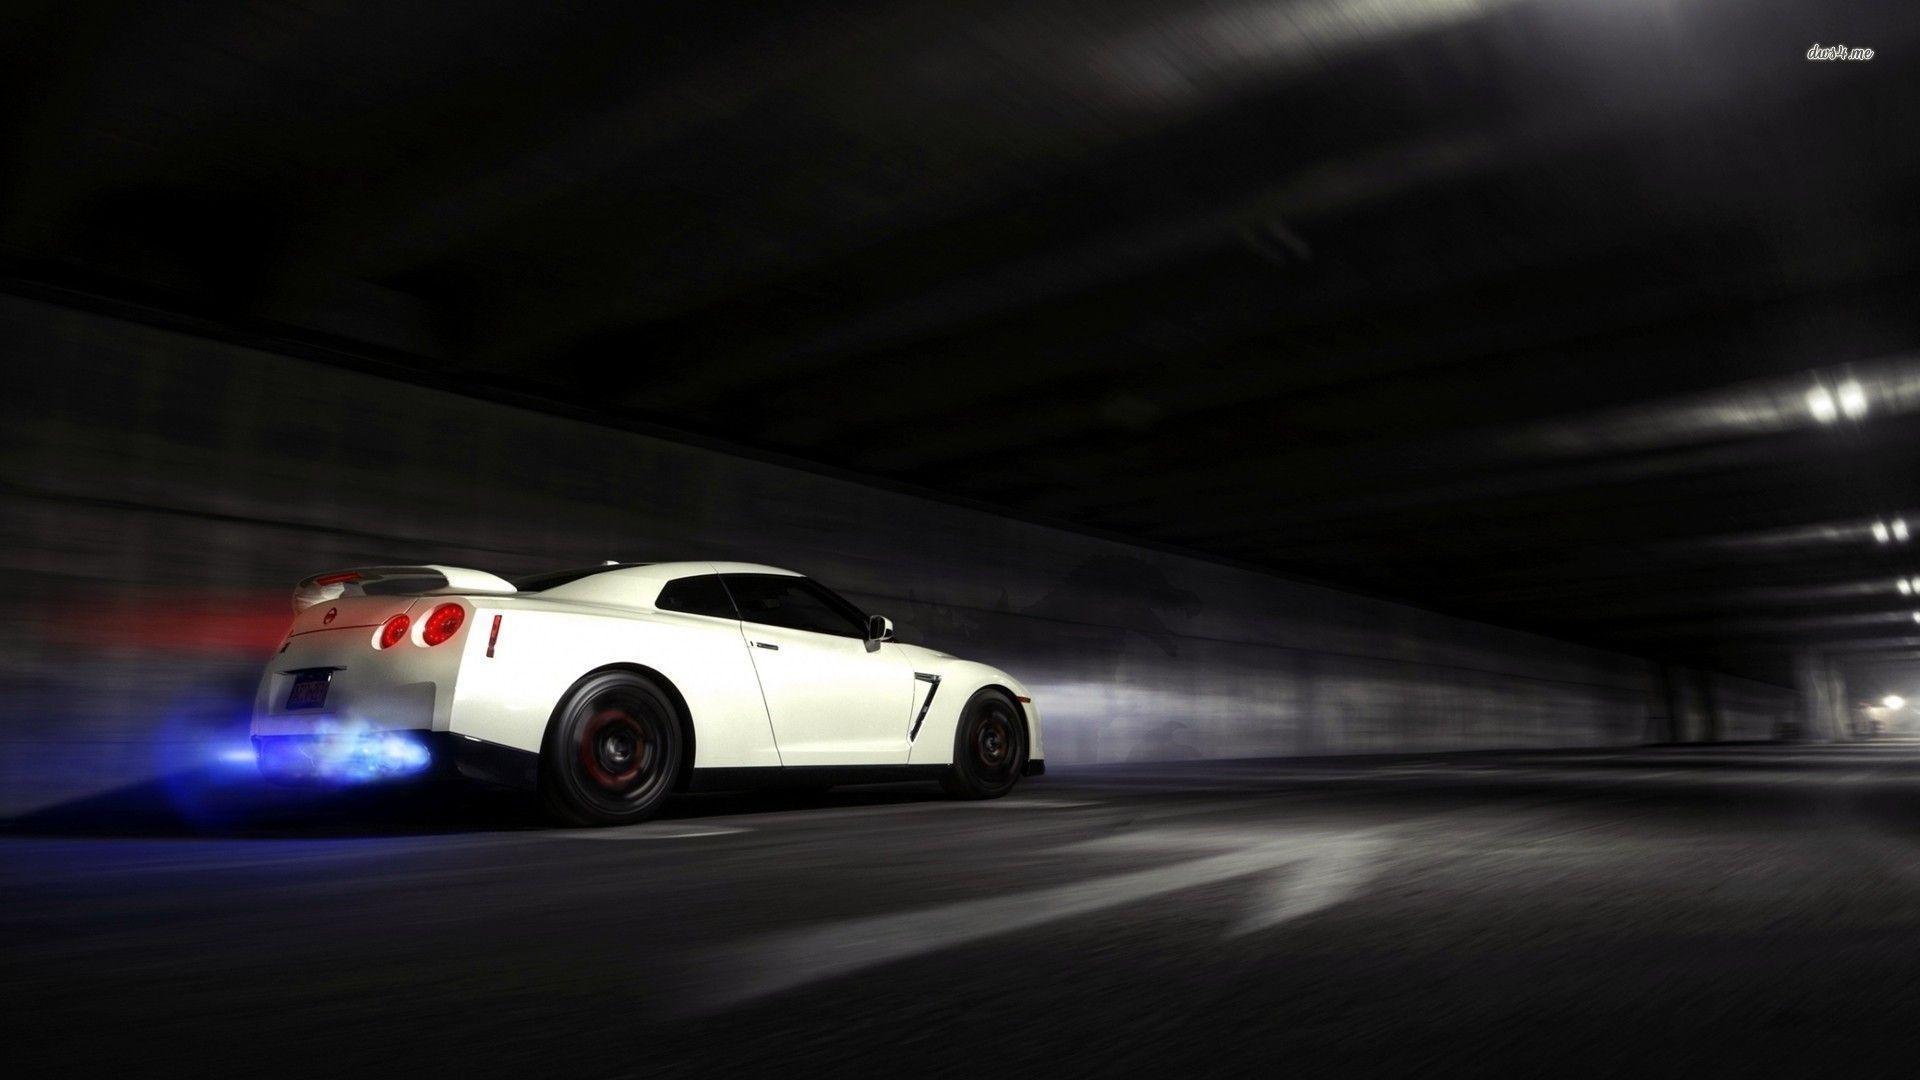 2015 Skyline GTR Wallpapers 1920x1080